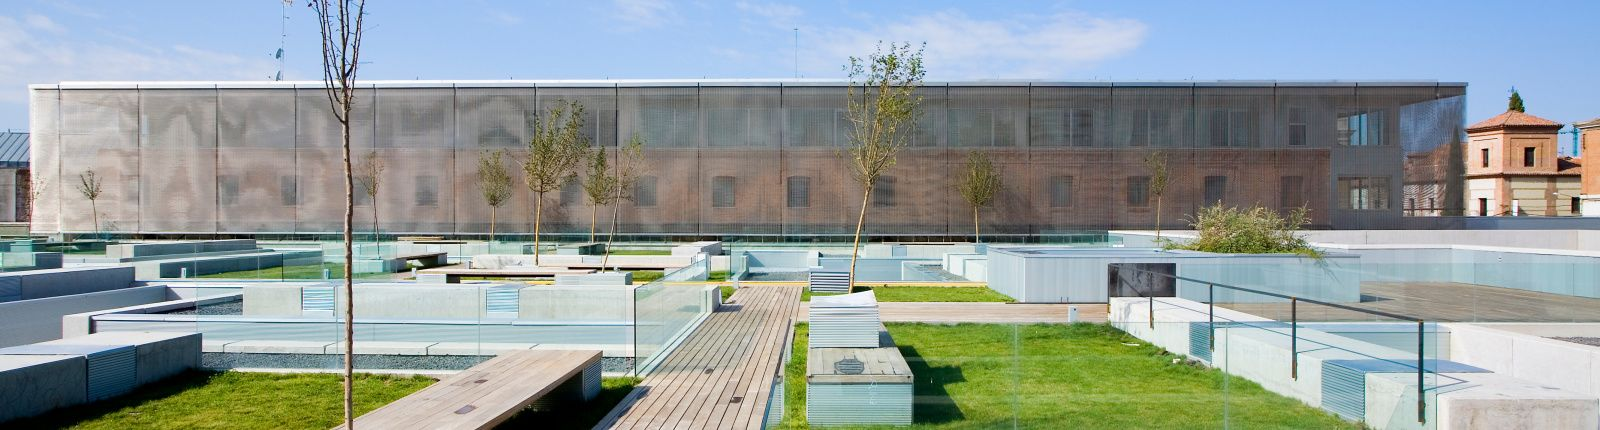 Ästhetische Sonnenschutzfassade in Alcalá de Henares, Spanien